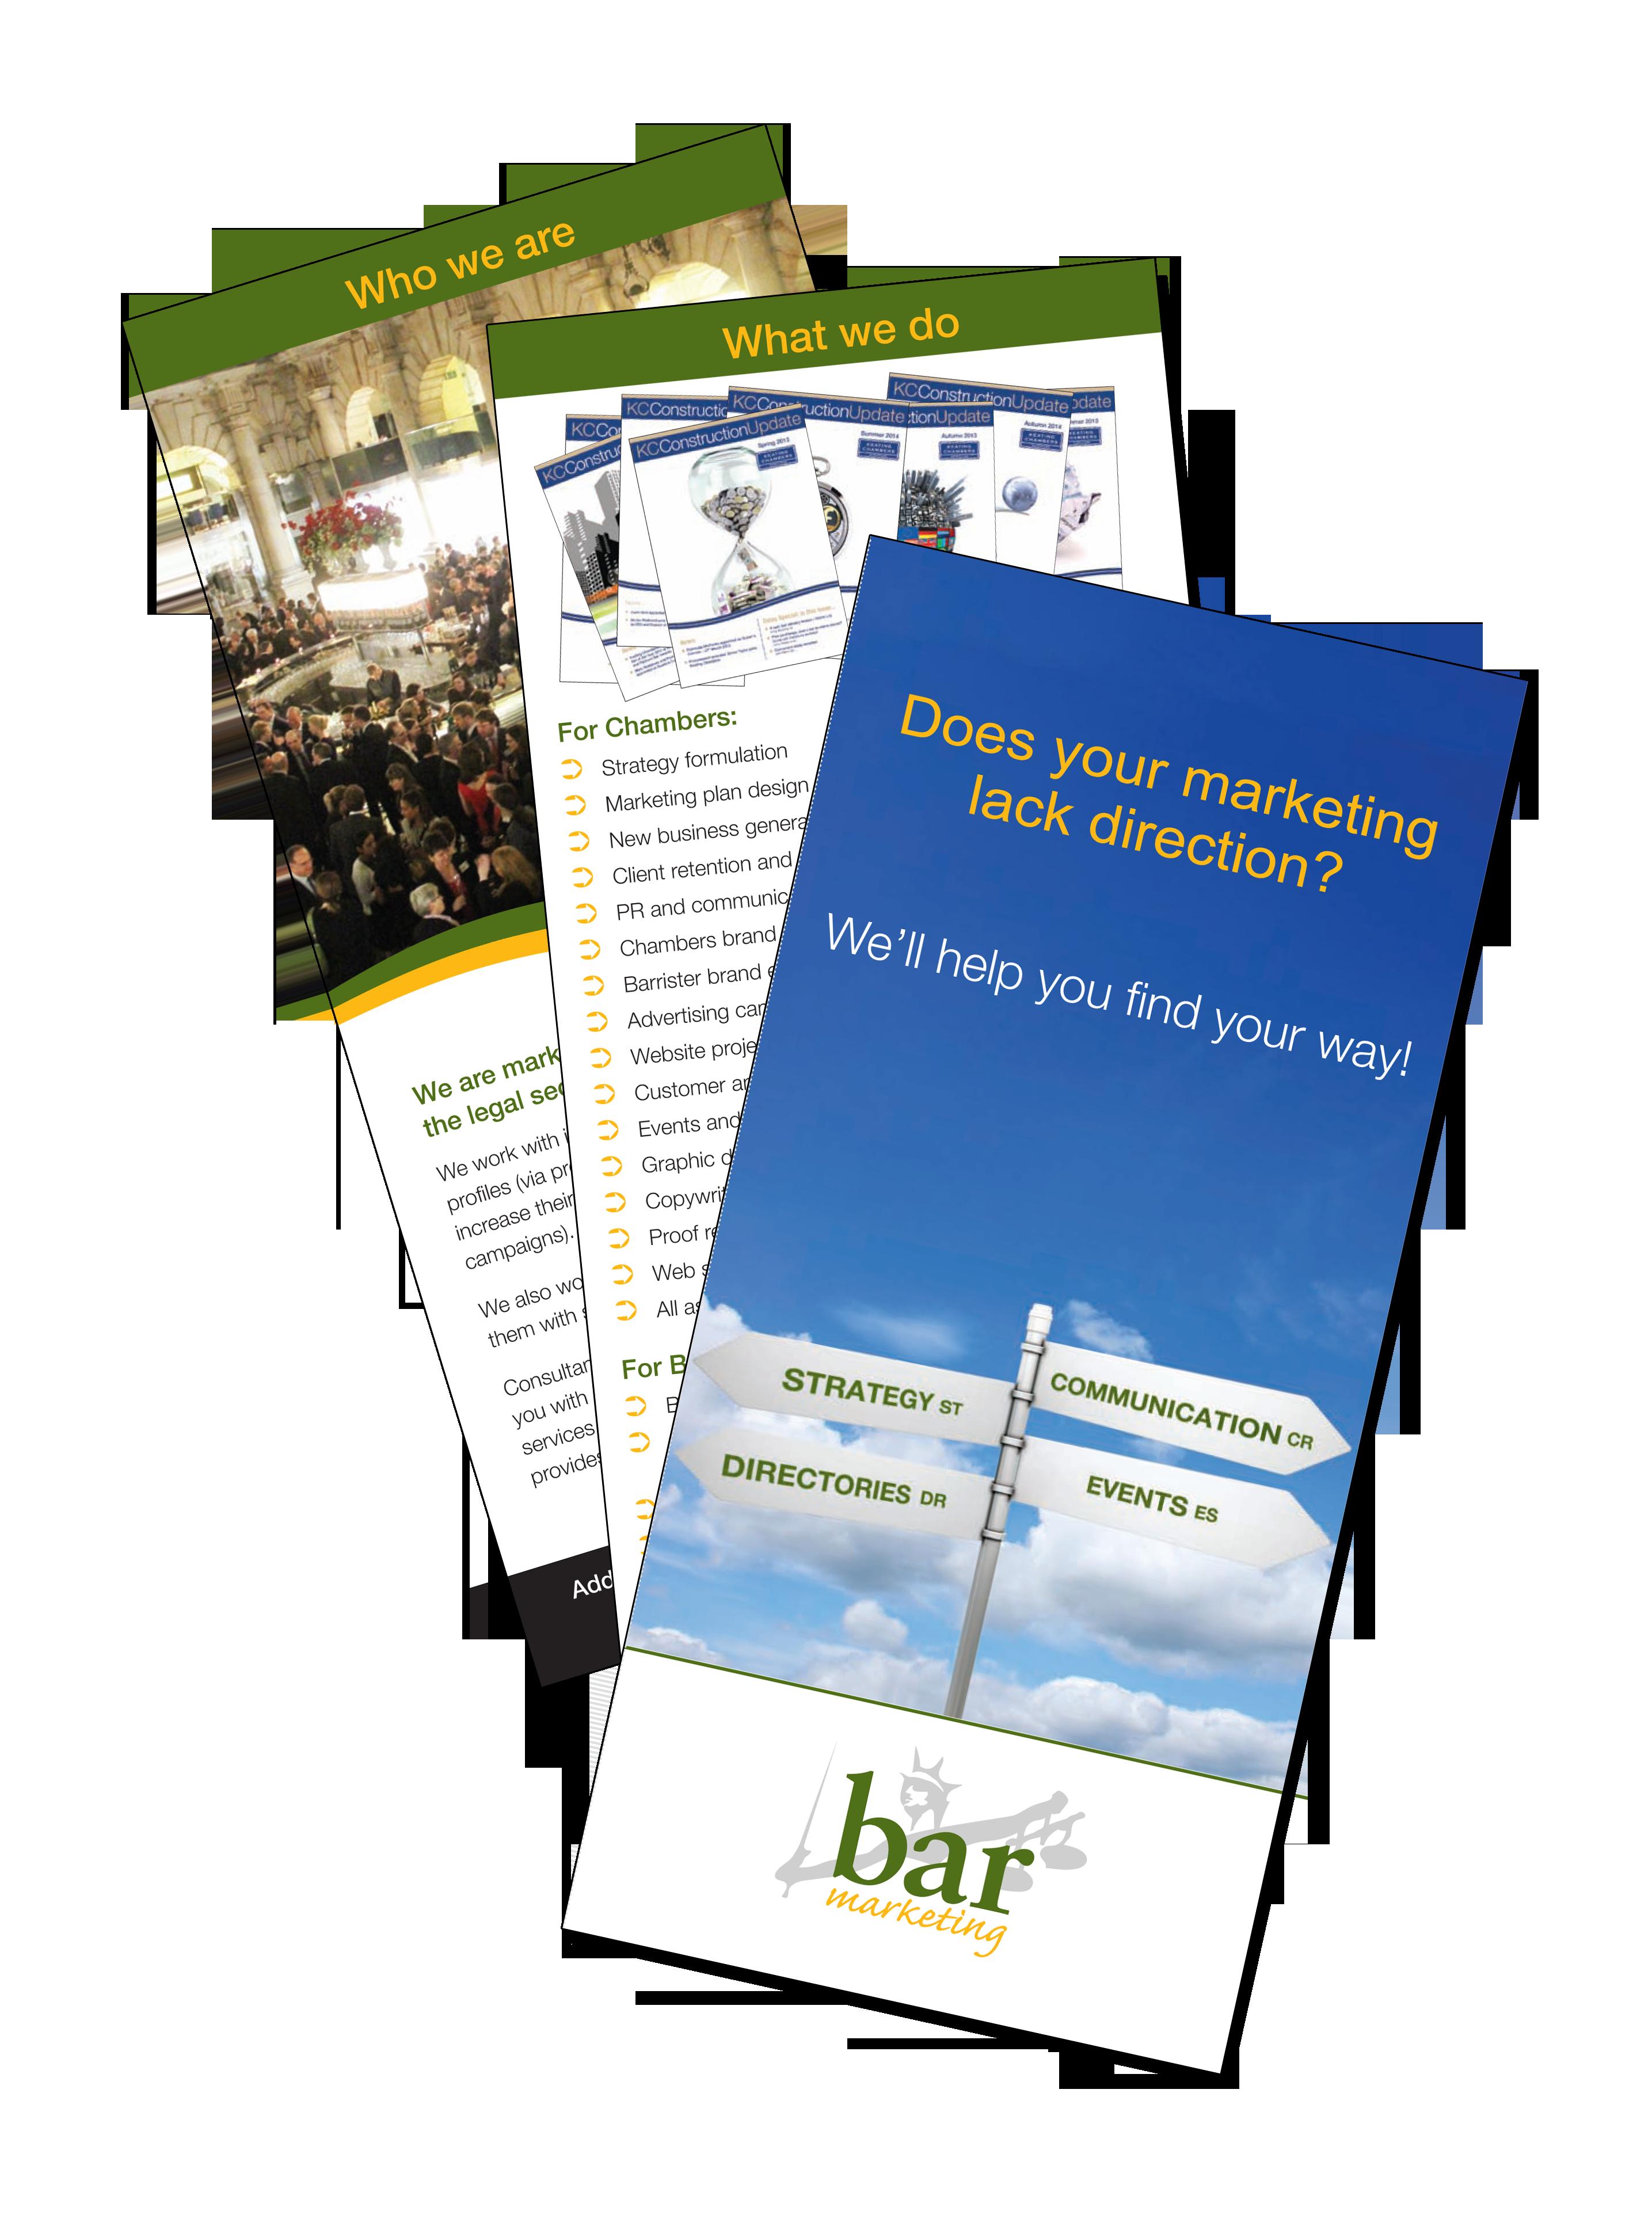 Bar Marketing on-demand overview